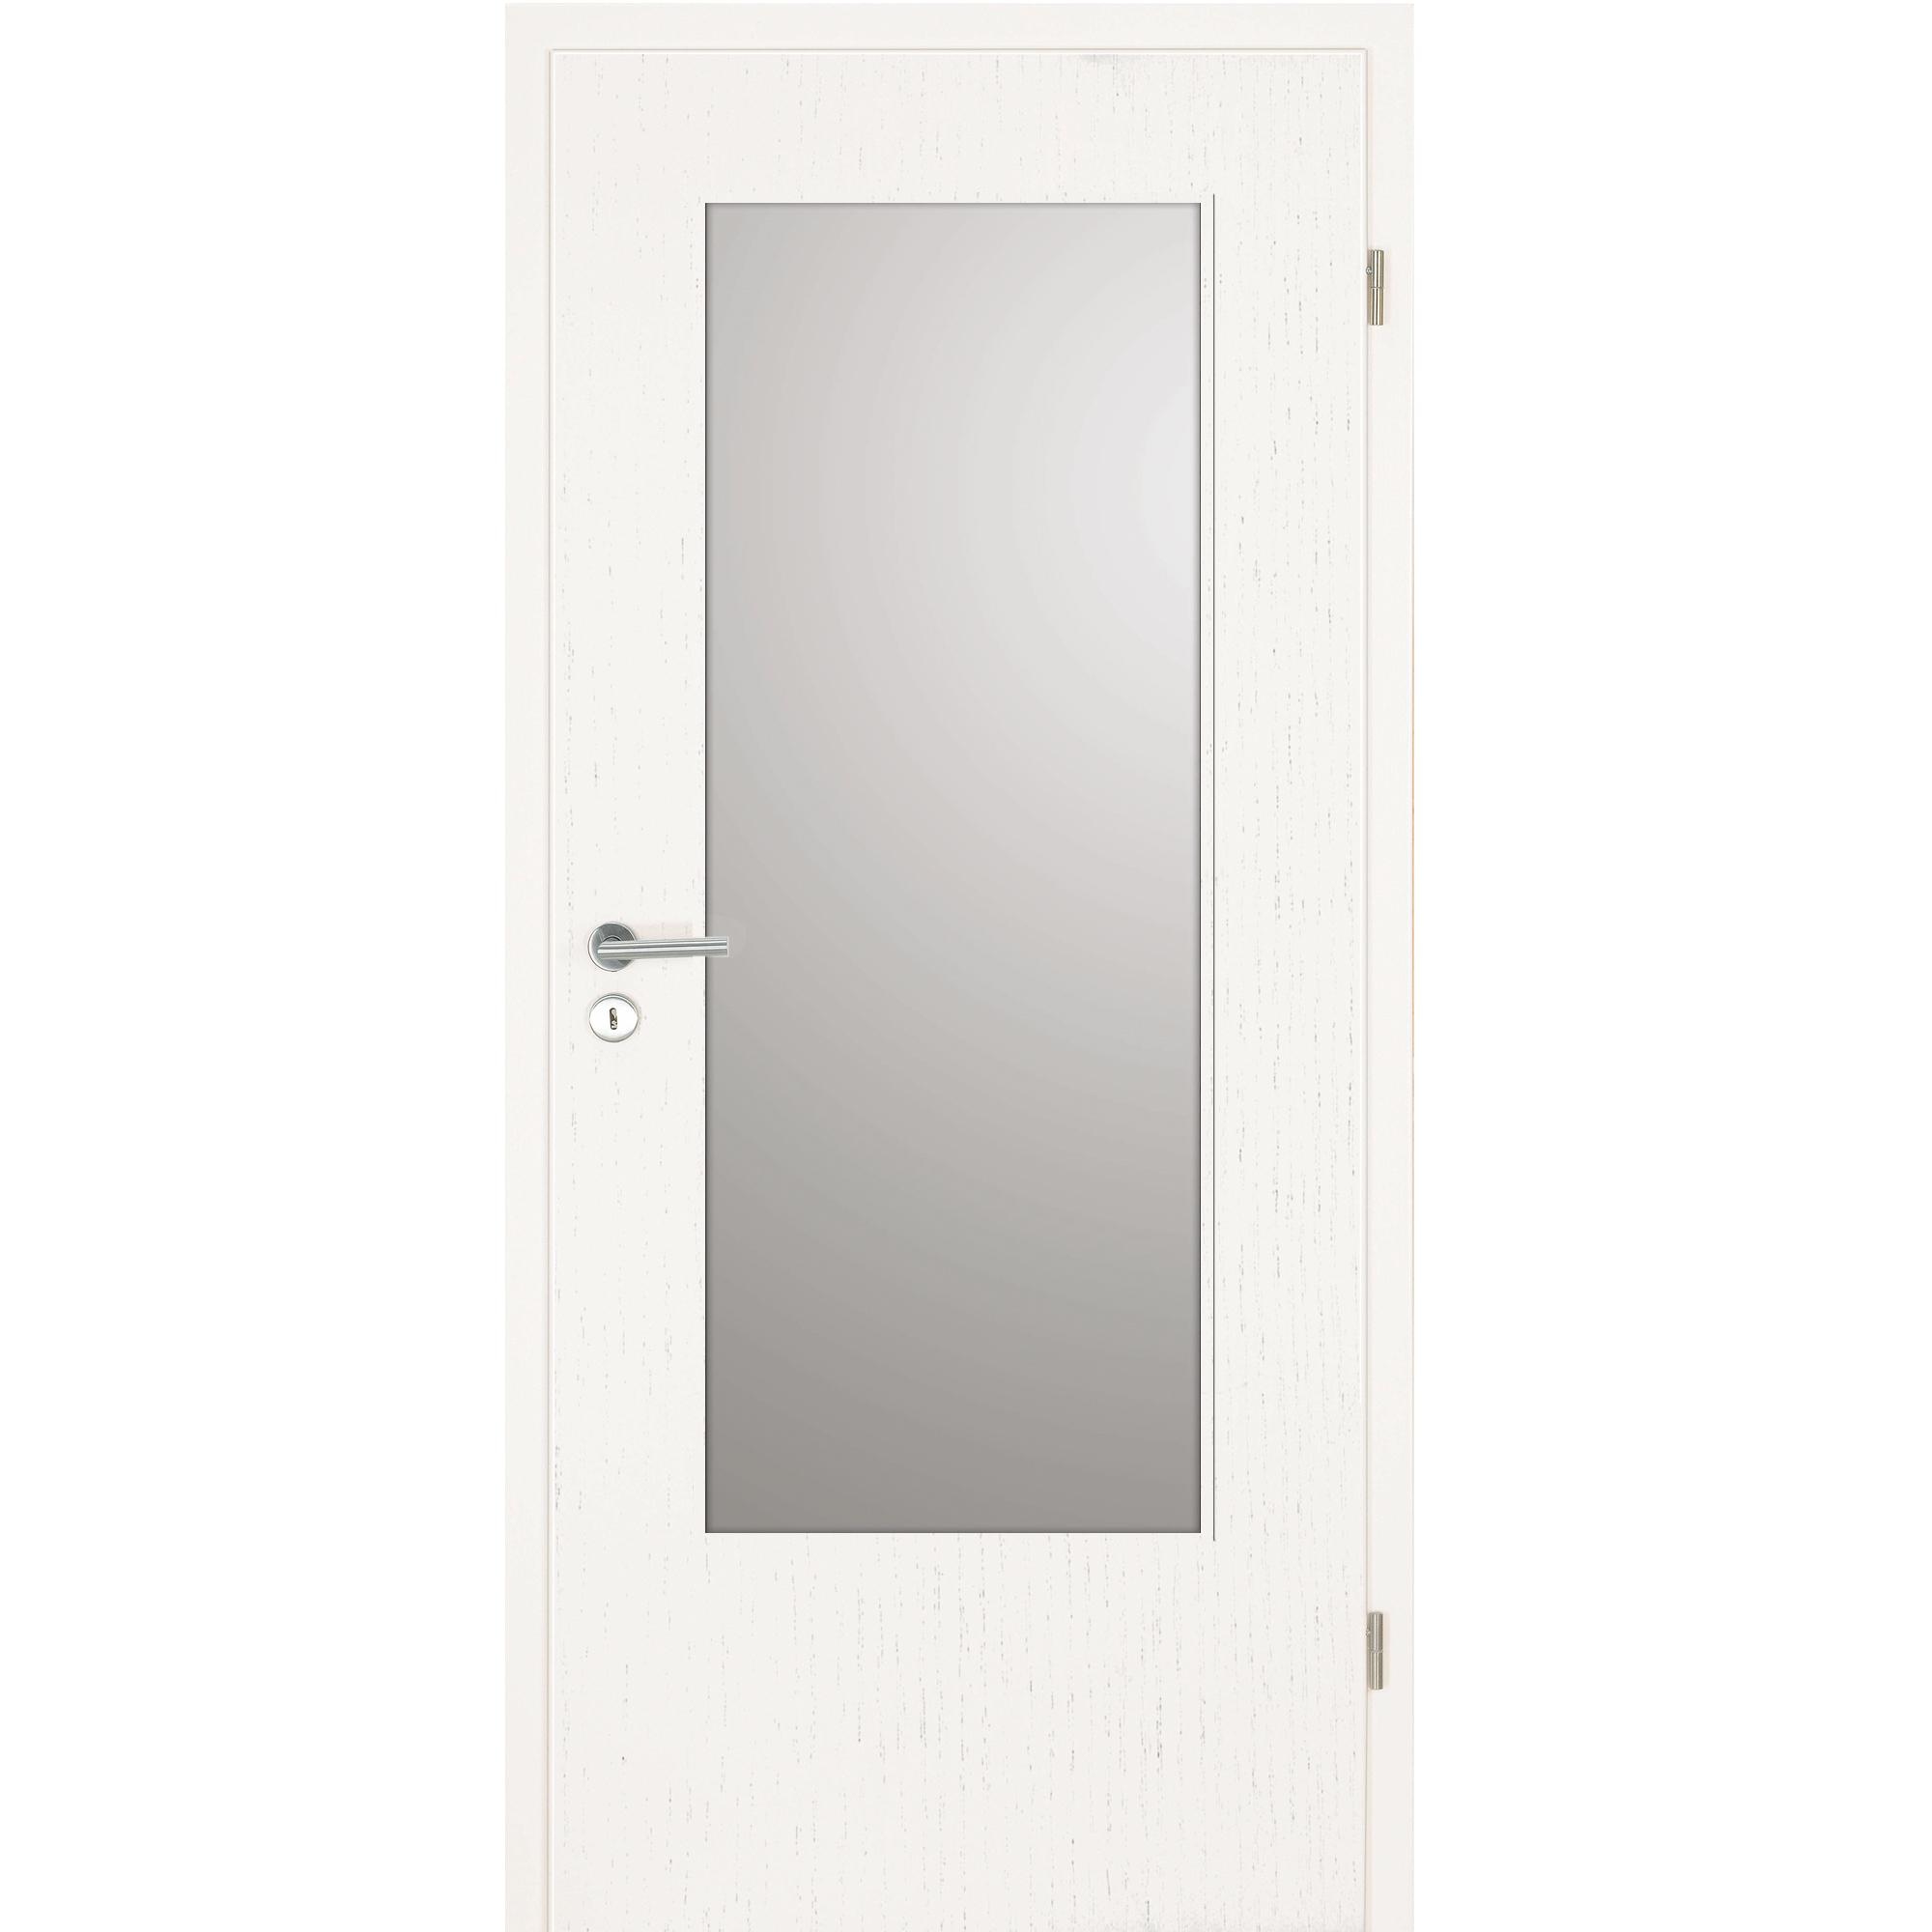 Zimmertur Mit Din La Esche Weiss Kp Holzshop De